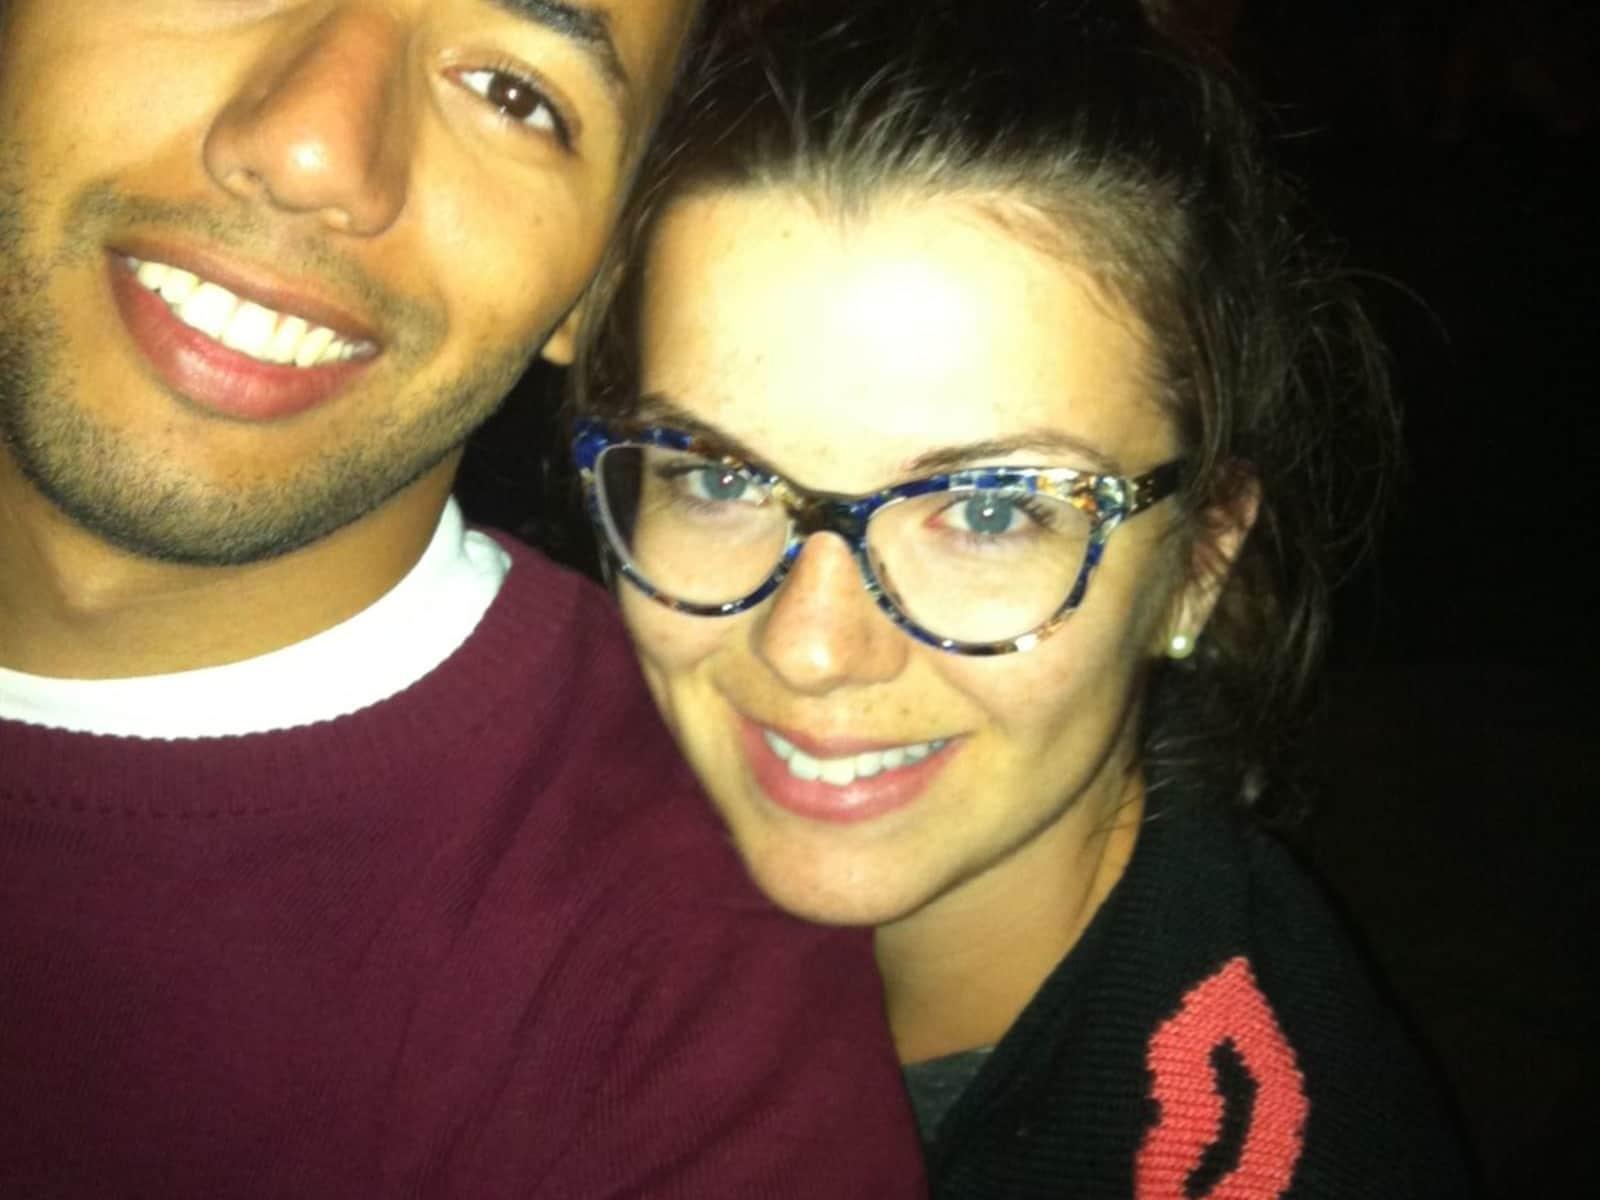 Ahmed & Jessie from Québec, Quebec, Canada